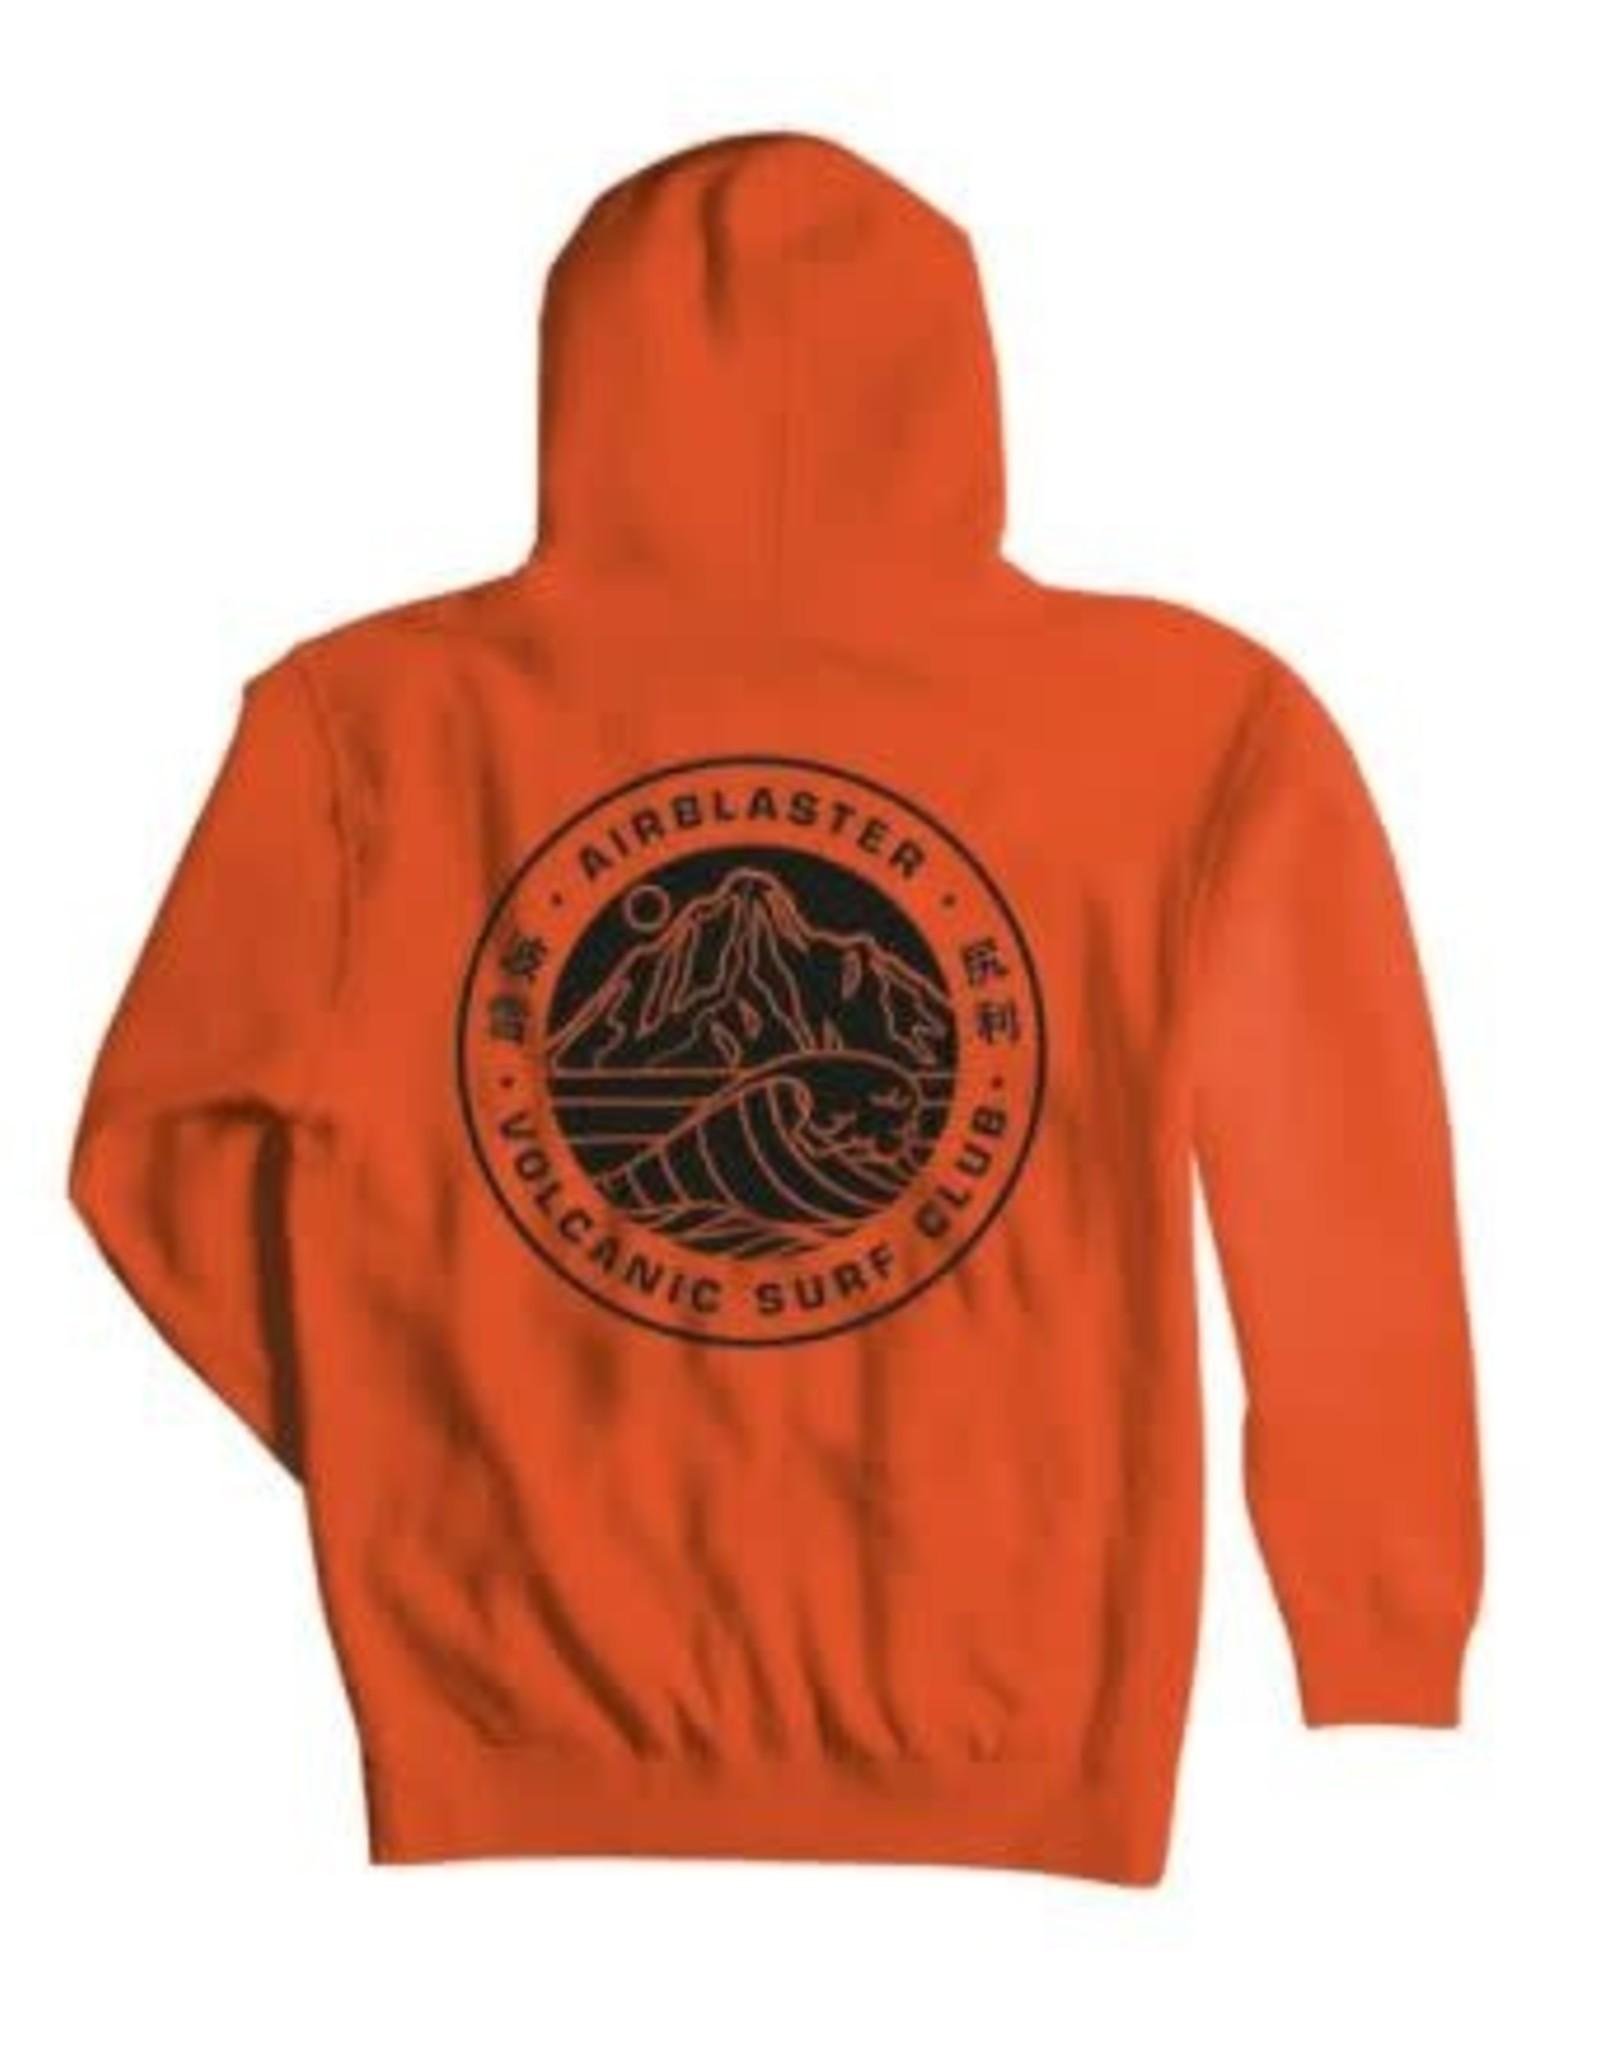 AIRBLASTER Volcanic Surf Club Hoodie